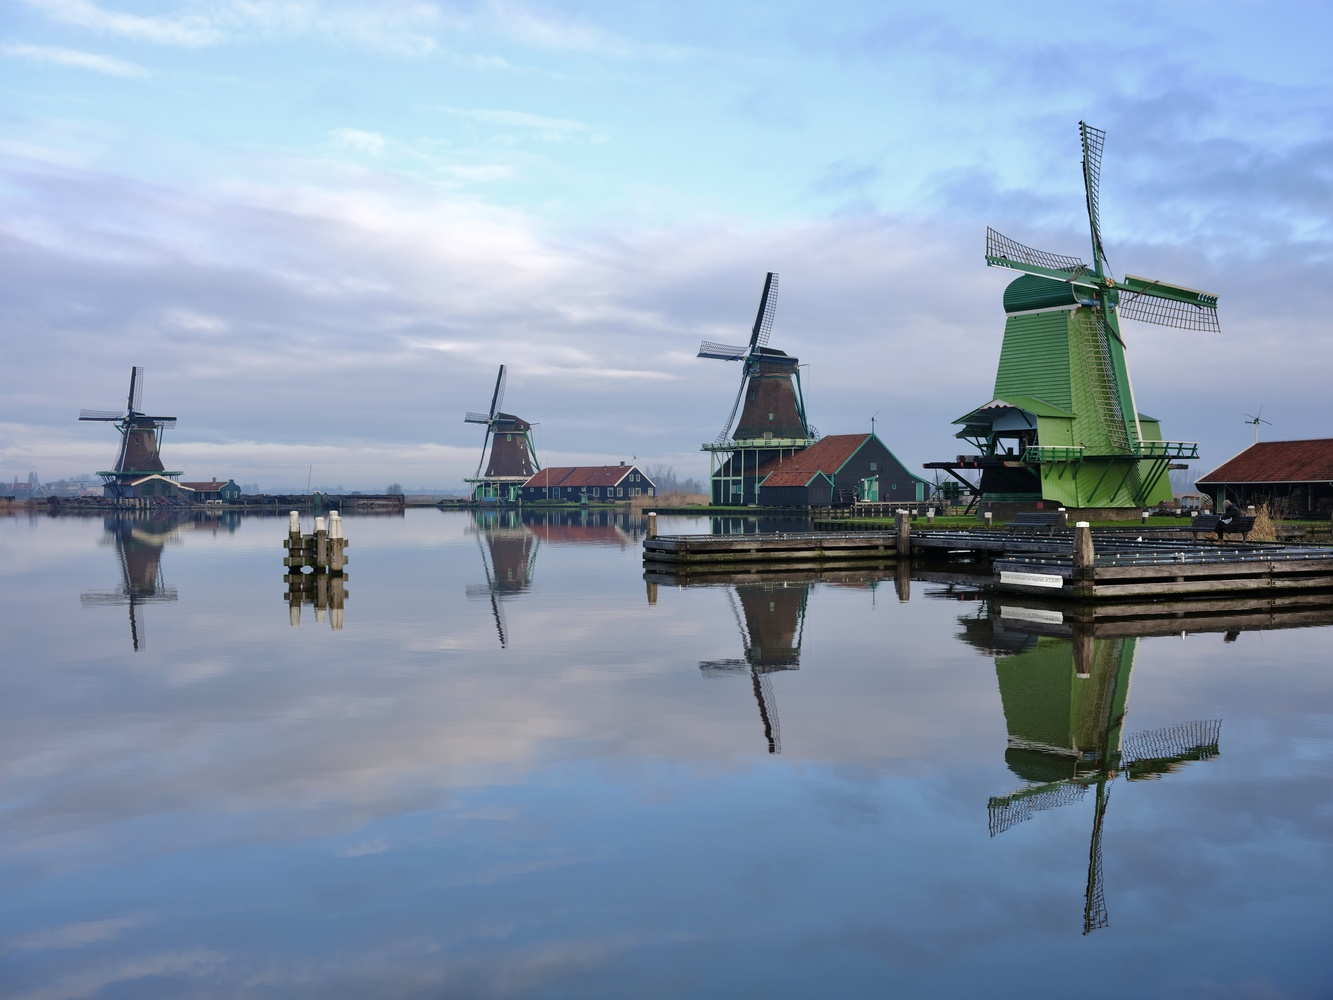 Zaanse Schans 2 by Cees Albers